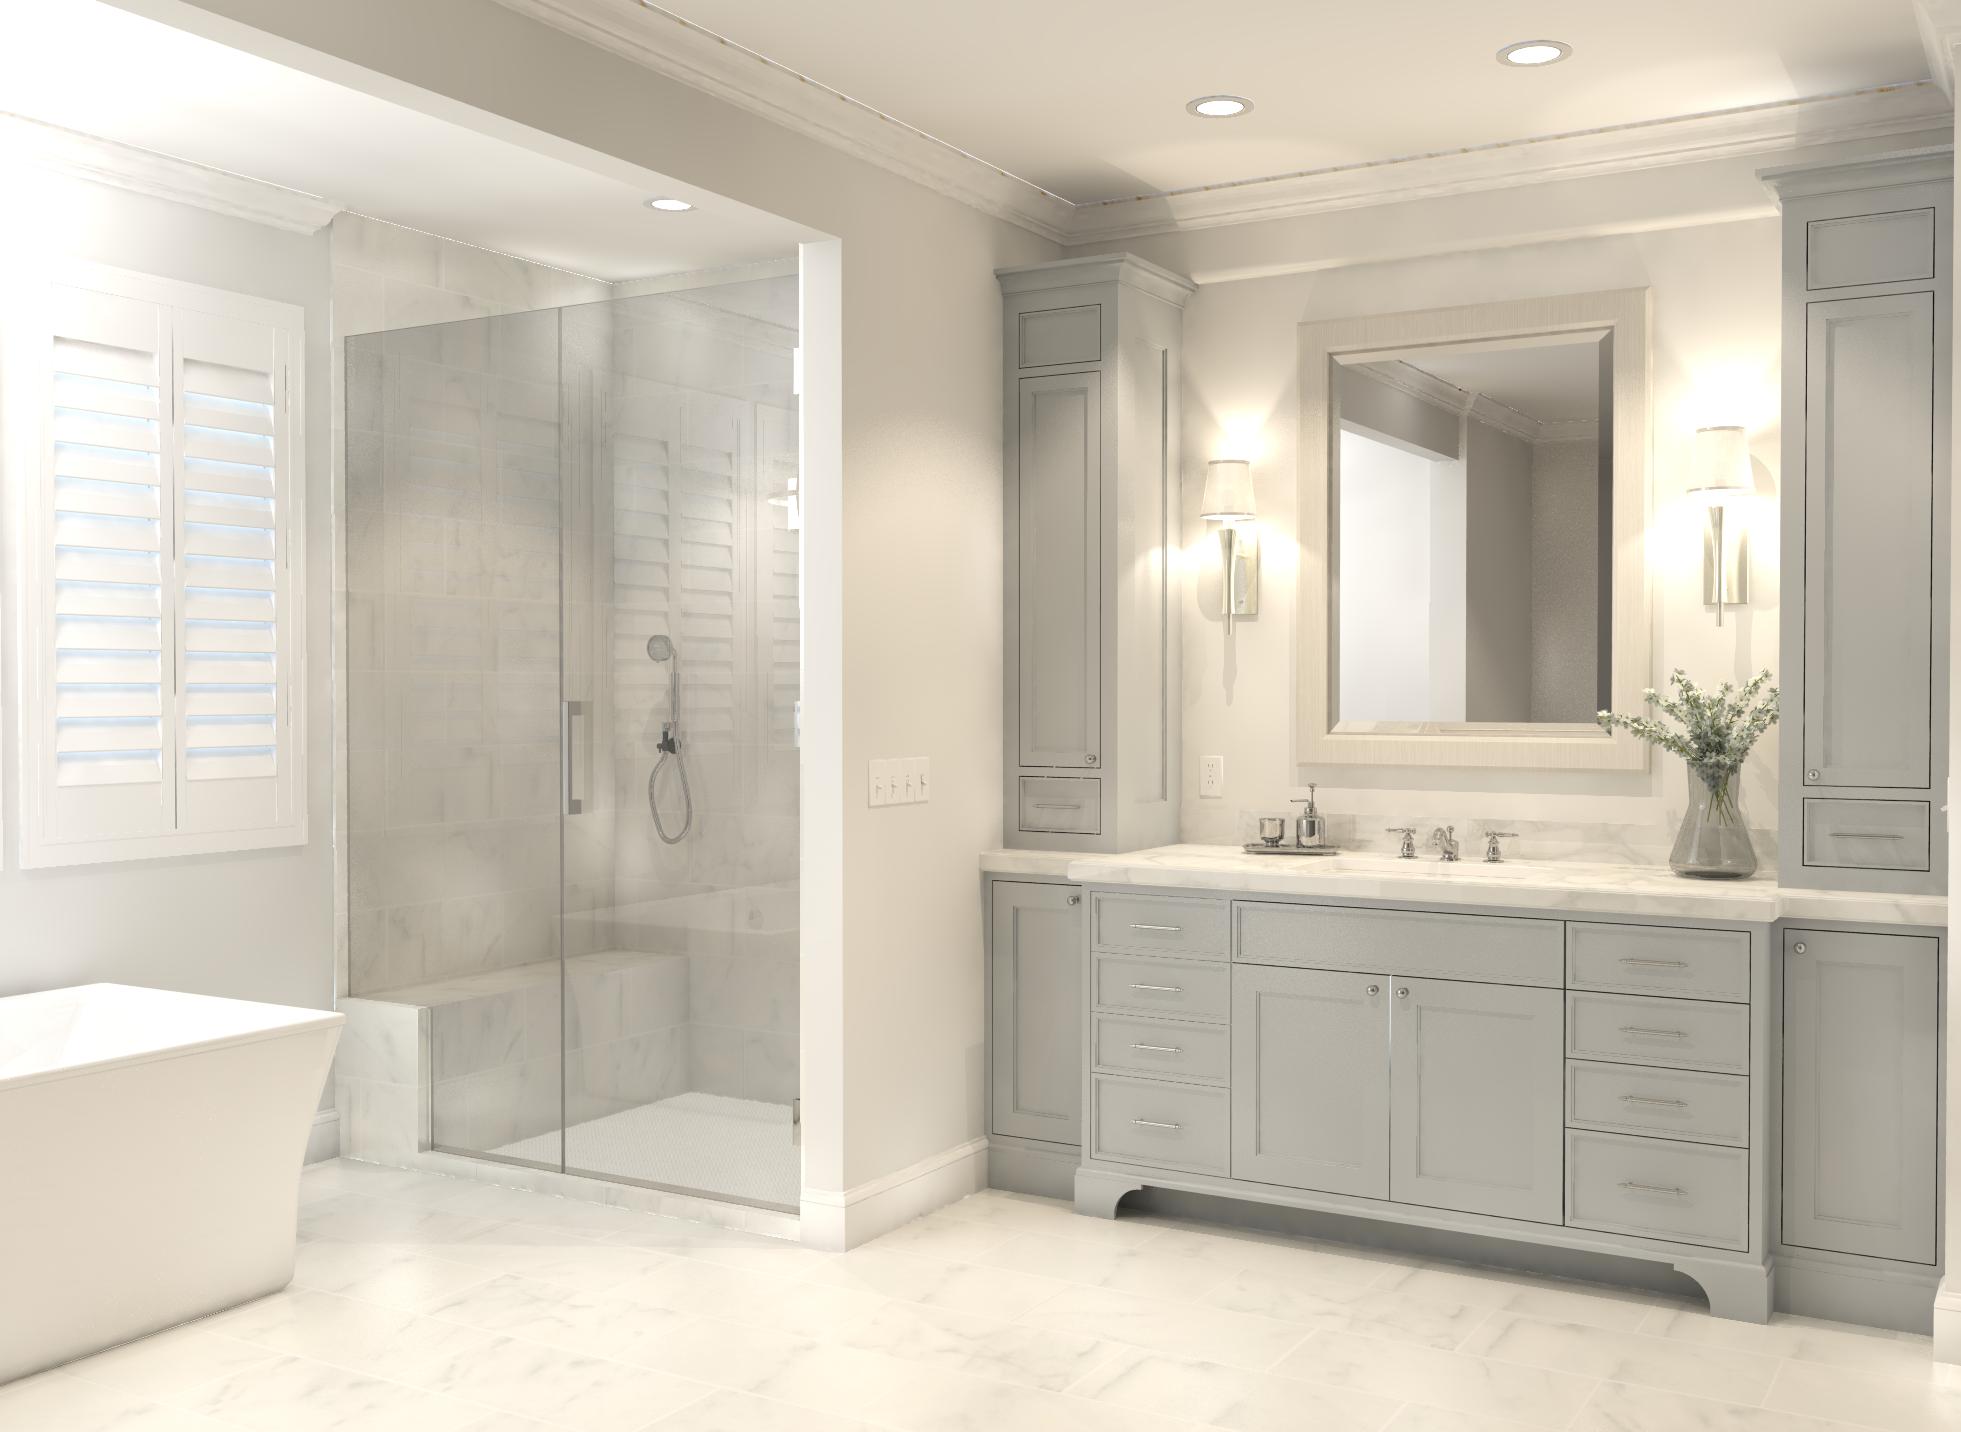 Bettina Master Bathroom 2018-02-15 19410700000.png